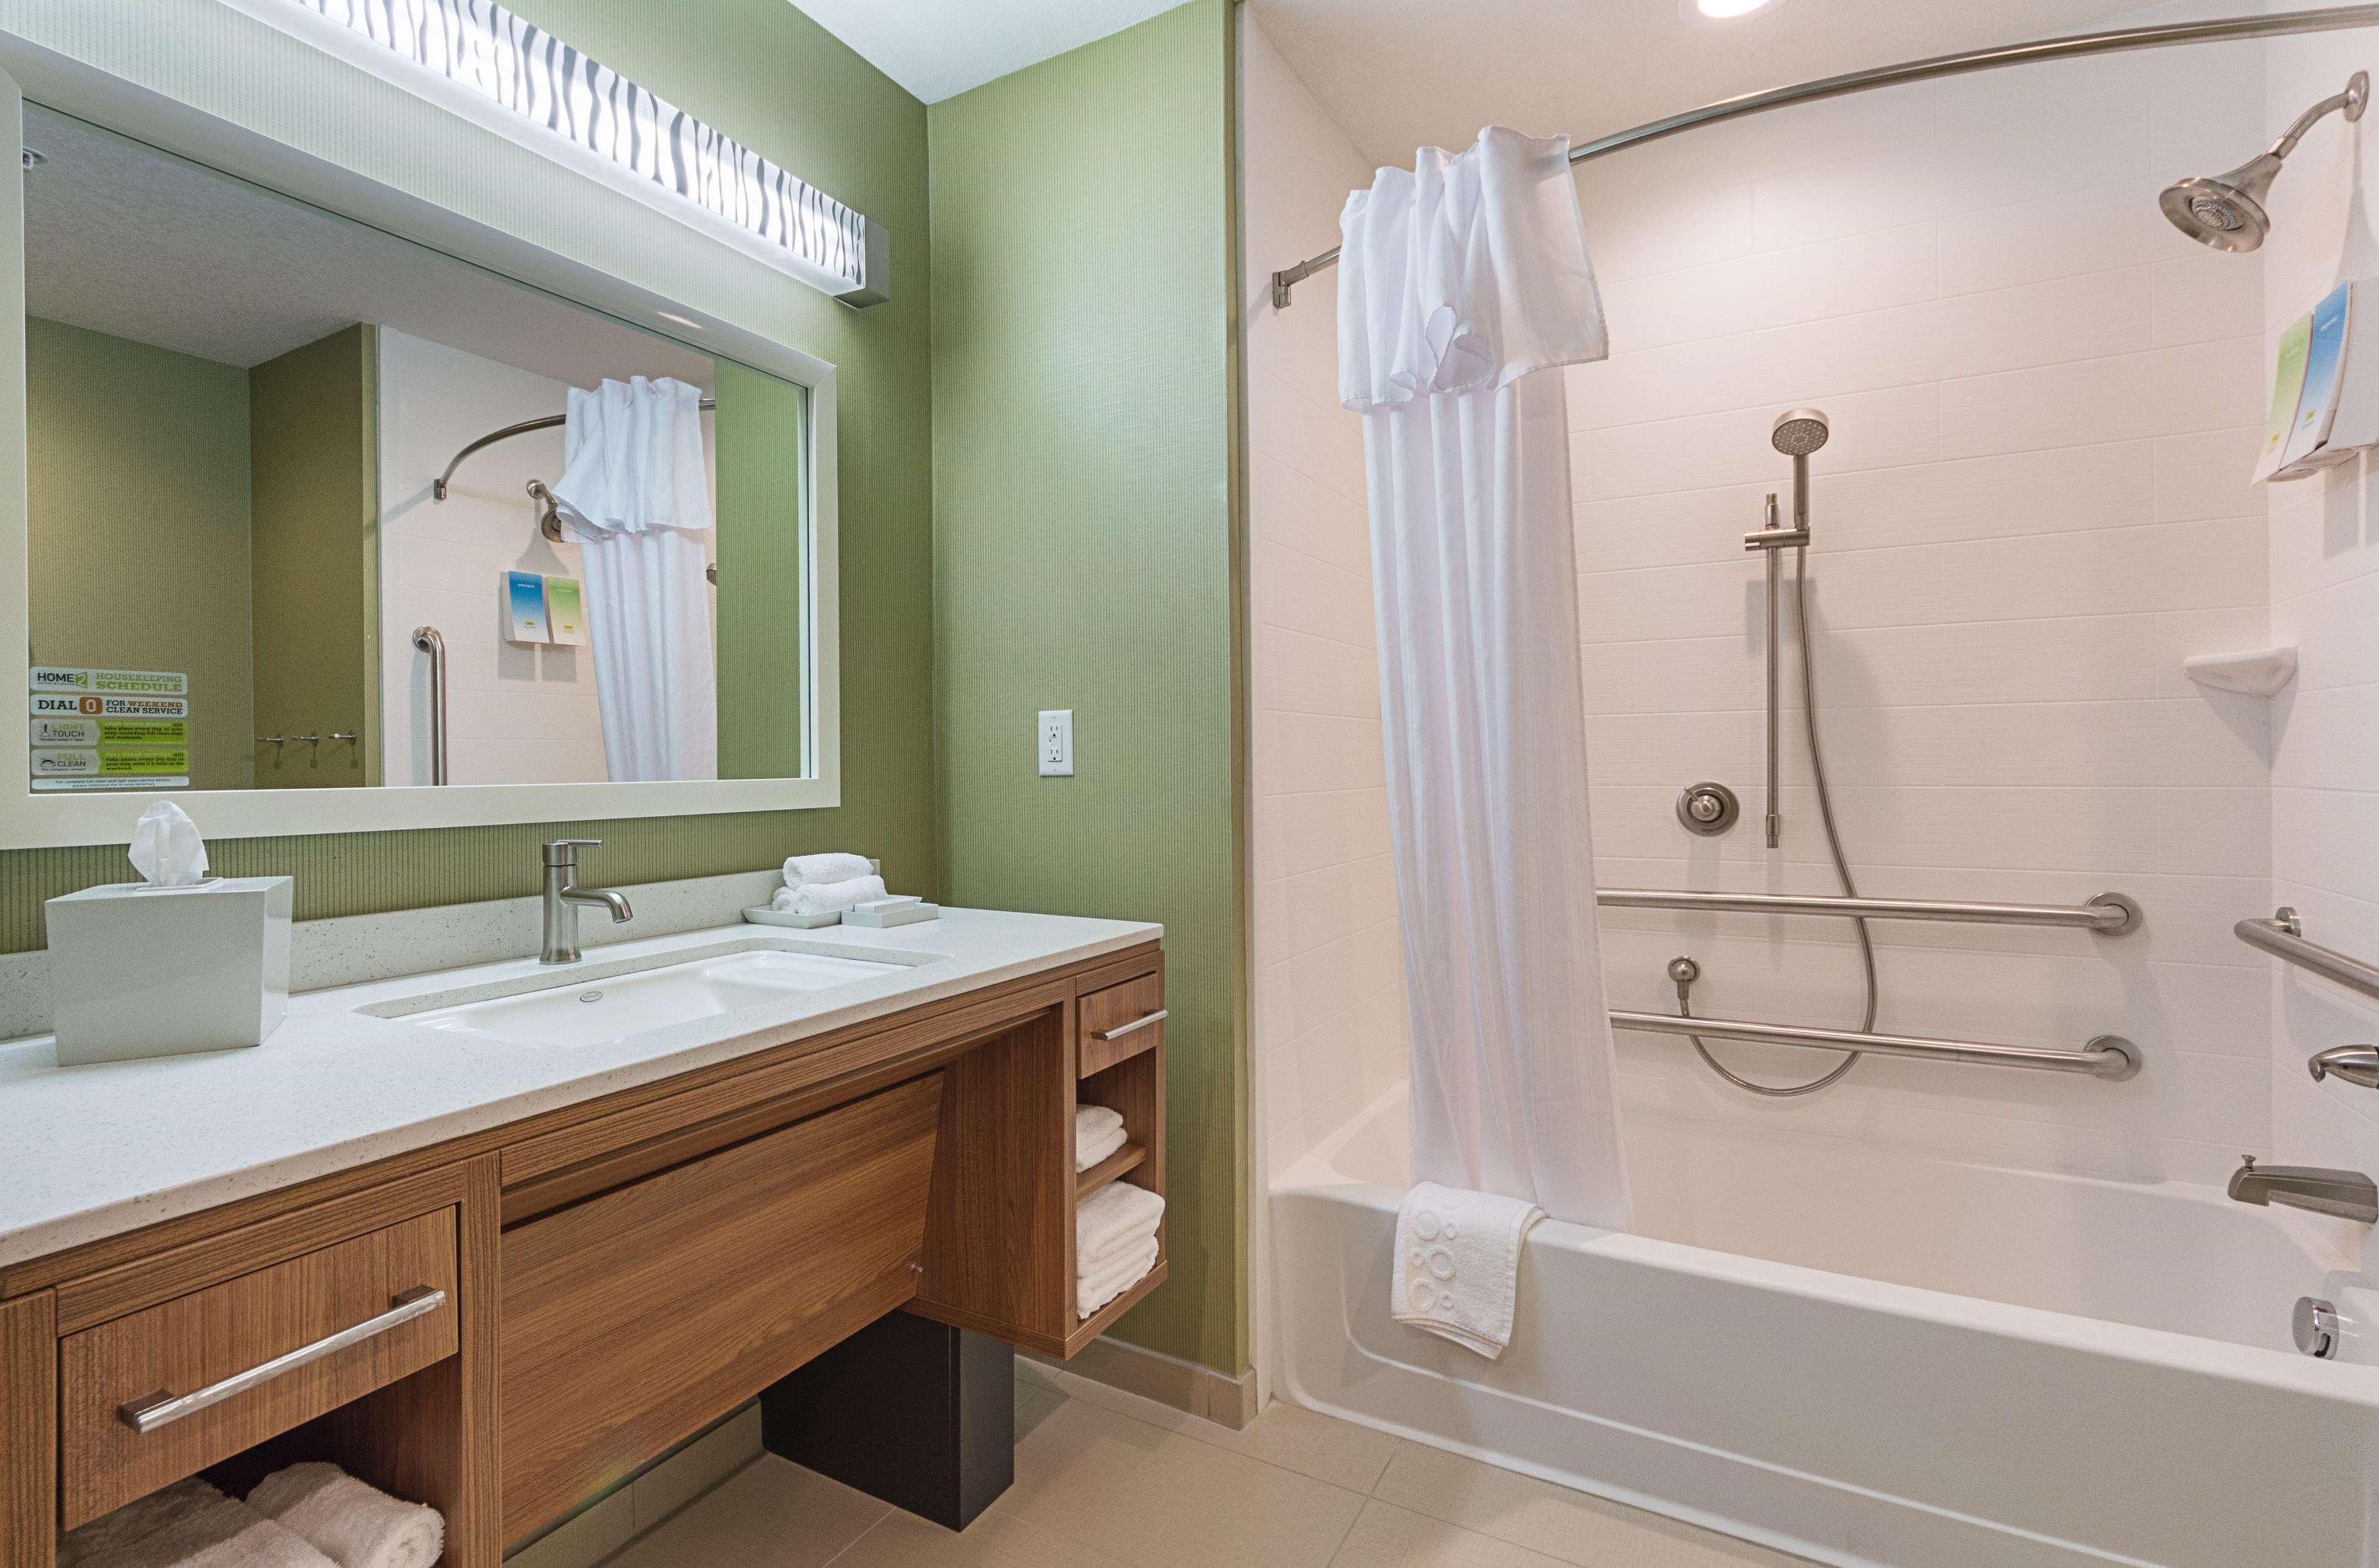 Home 2 Suites by Hilton - Yukon image 37